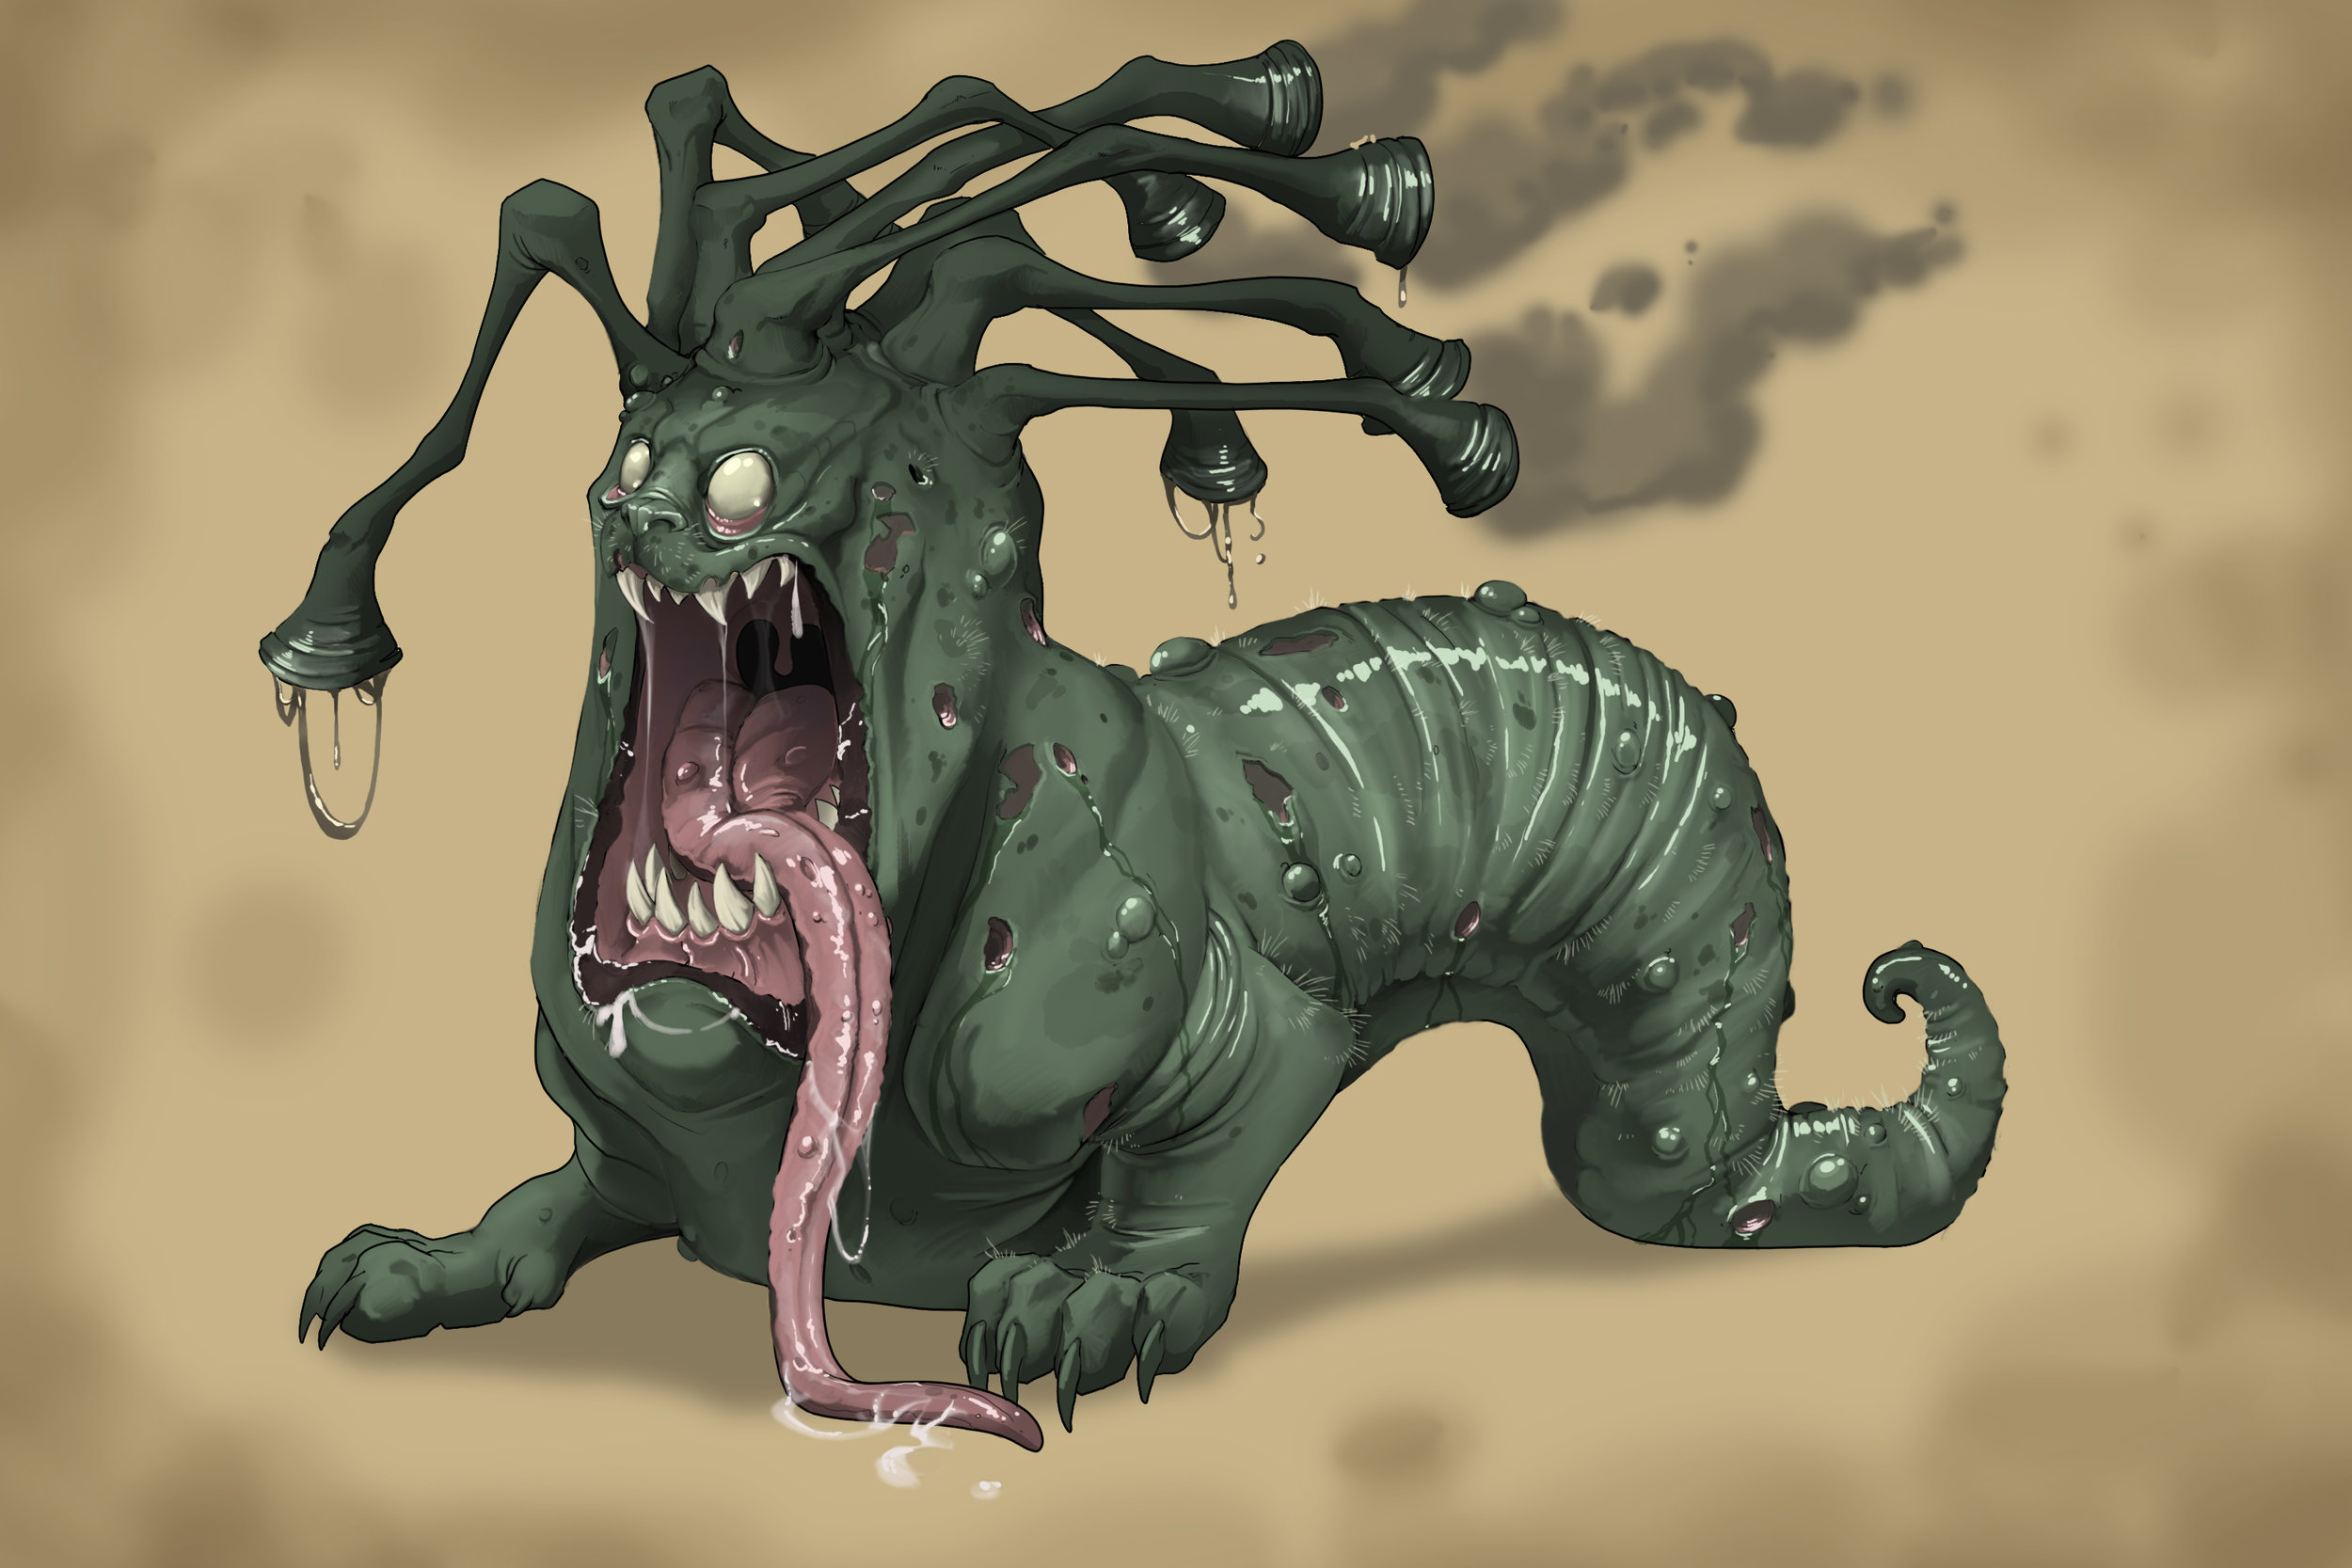 Beast_of_Nurgle_by_ciggypiggy